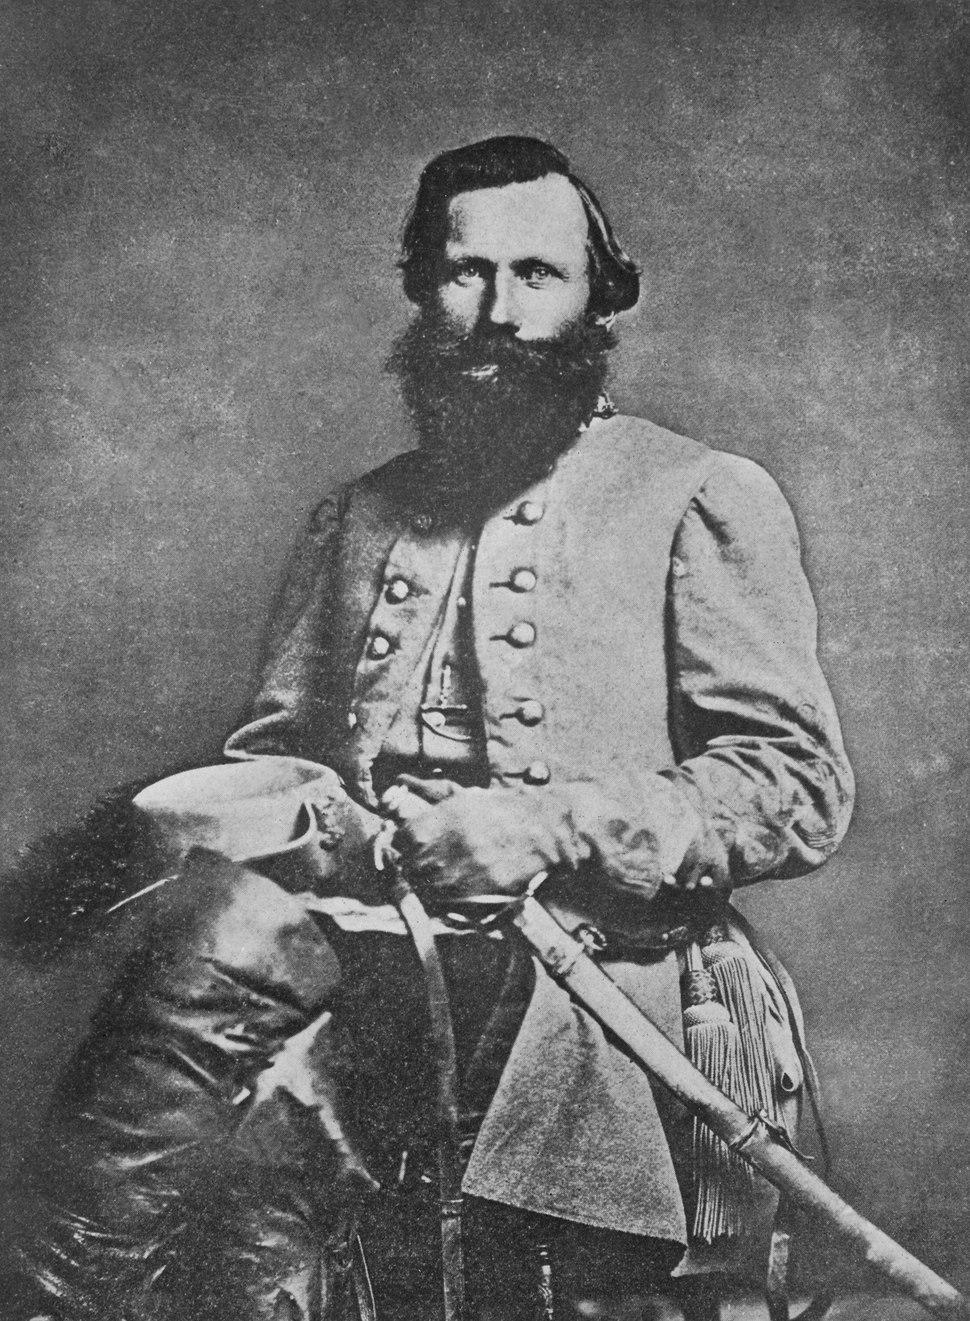 "General ""Jeb"" Stuart, Confederate States of America, 1863, 1961 - 1986 - NARA - 518135"